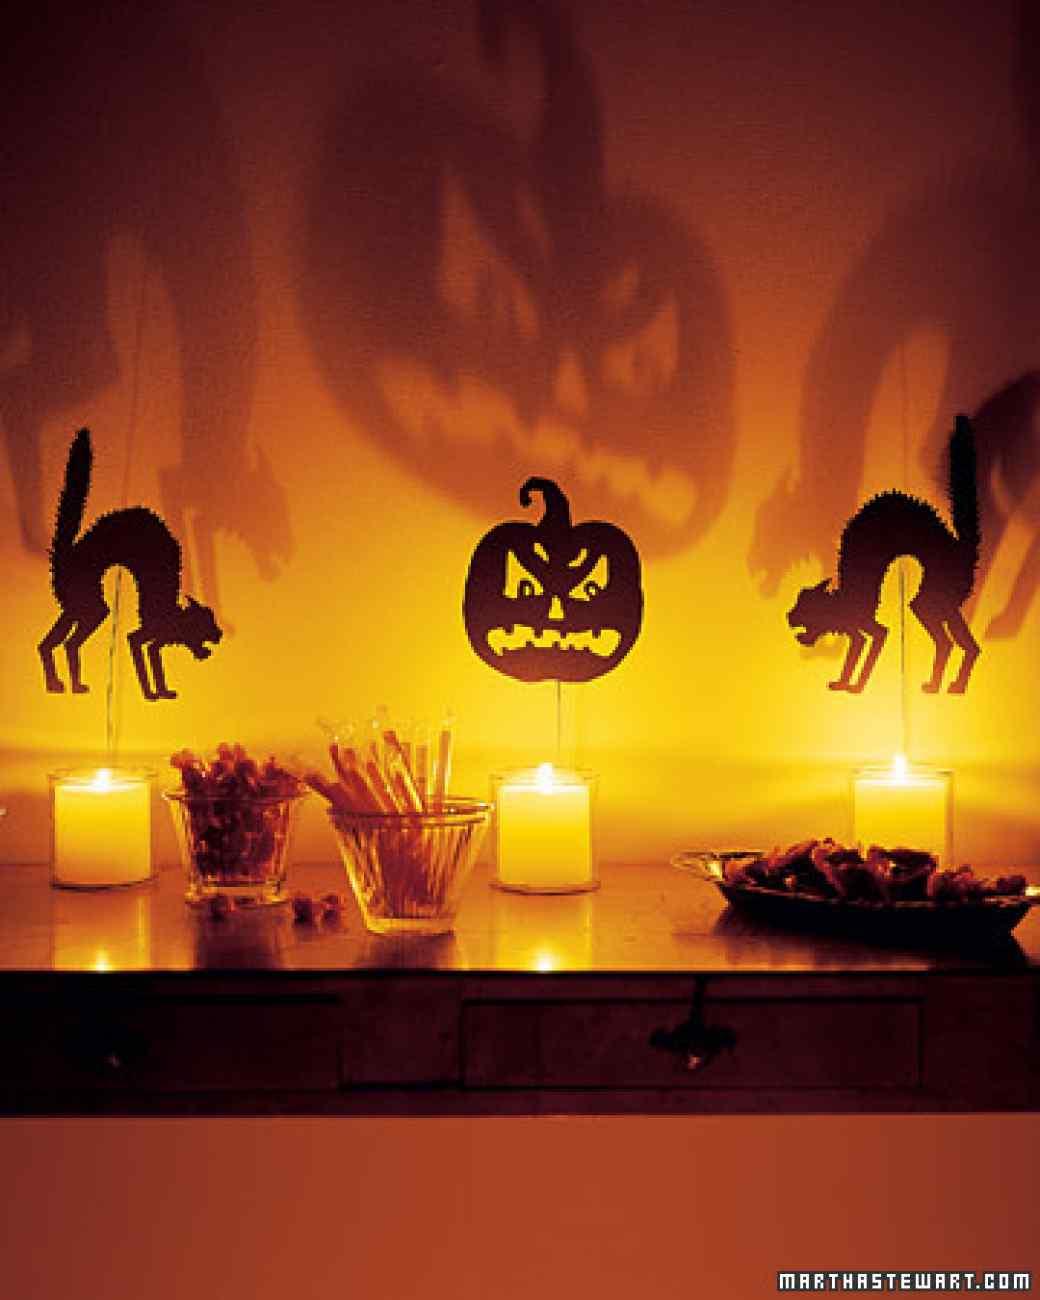 Diy indoor halloween decorations - 49 Silhouettes Throw Off Spooky Fun